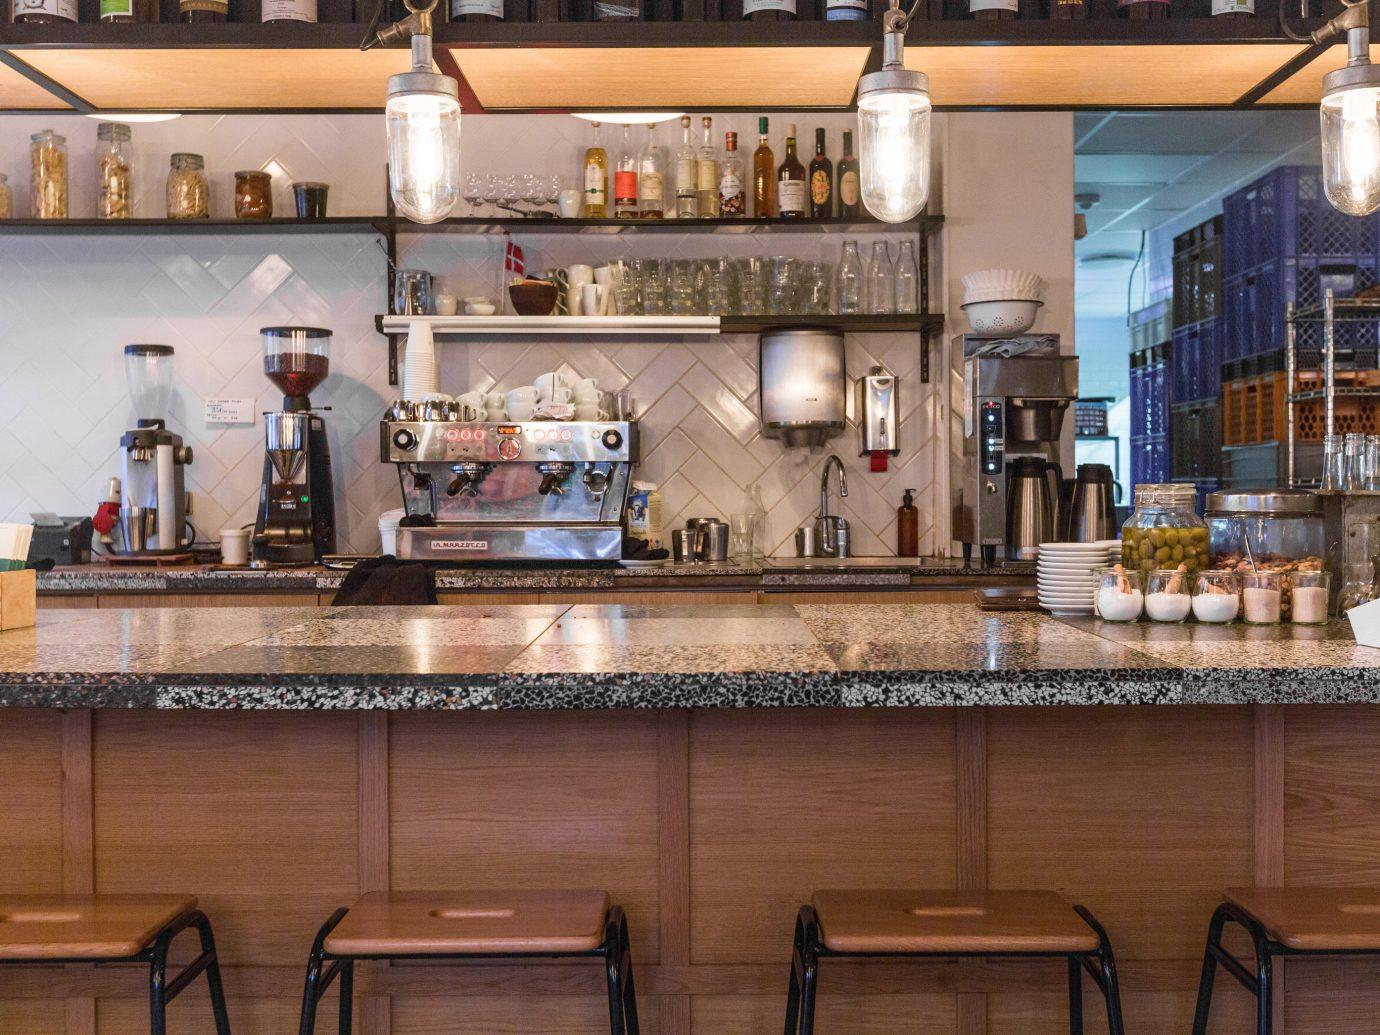 Copenhagen Denmark Trip Ideas indoor Kitchen countertop counter interior design restaurant café Bar table cluttered Island